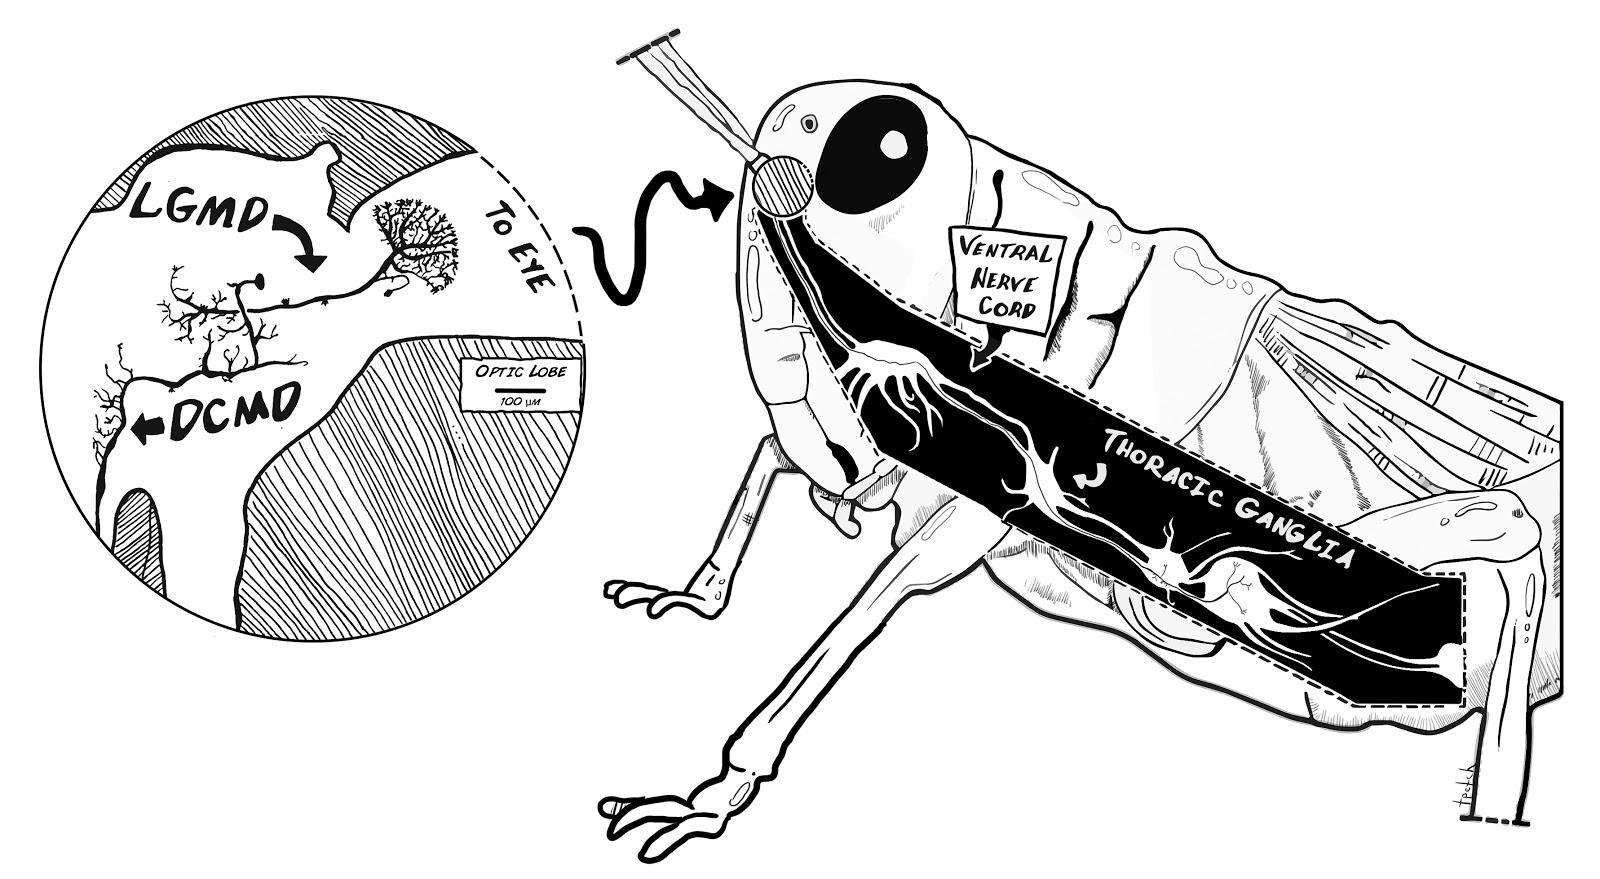 Experiment: Investigating Grasshopper Vision